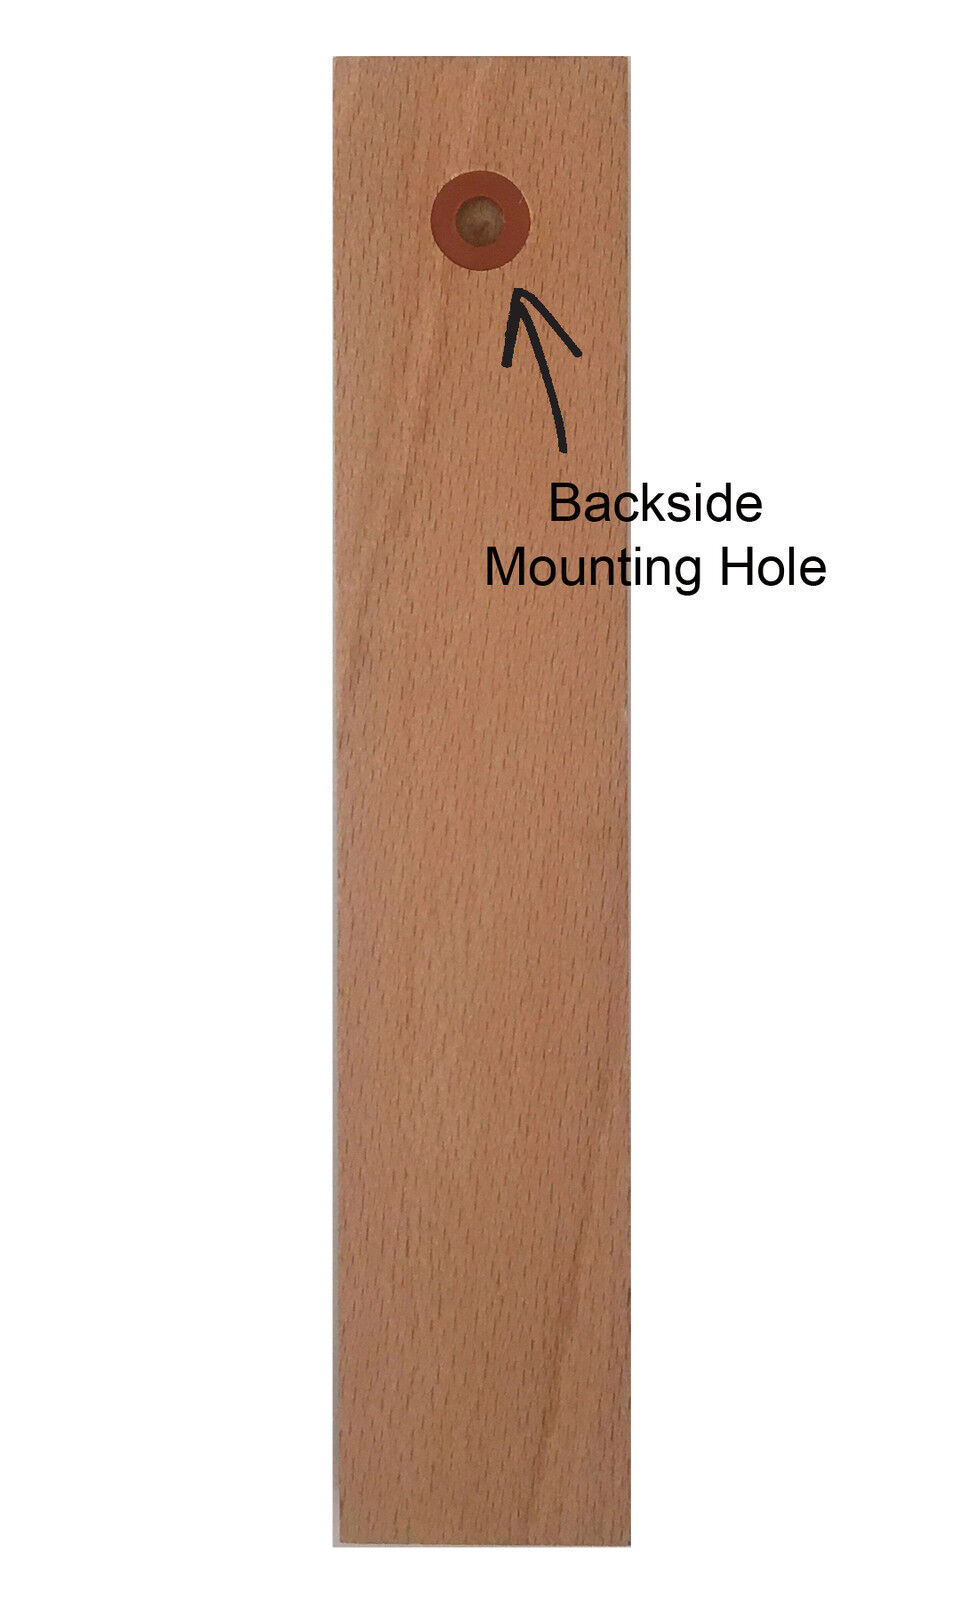 Analog Wall Thermometer Fahrenheit Scale Wood Walnut Finish 7.8 inch tall